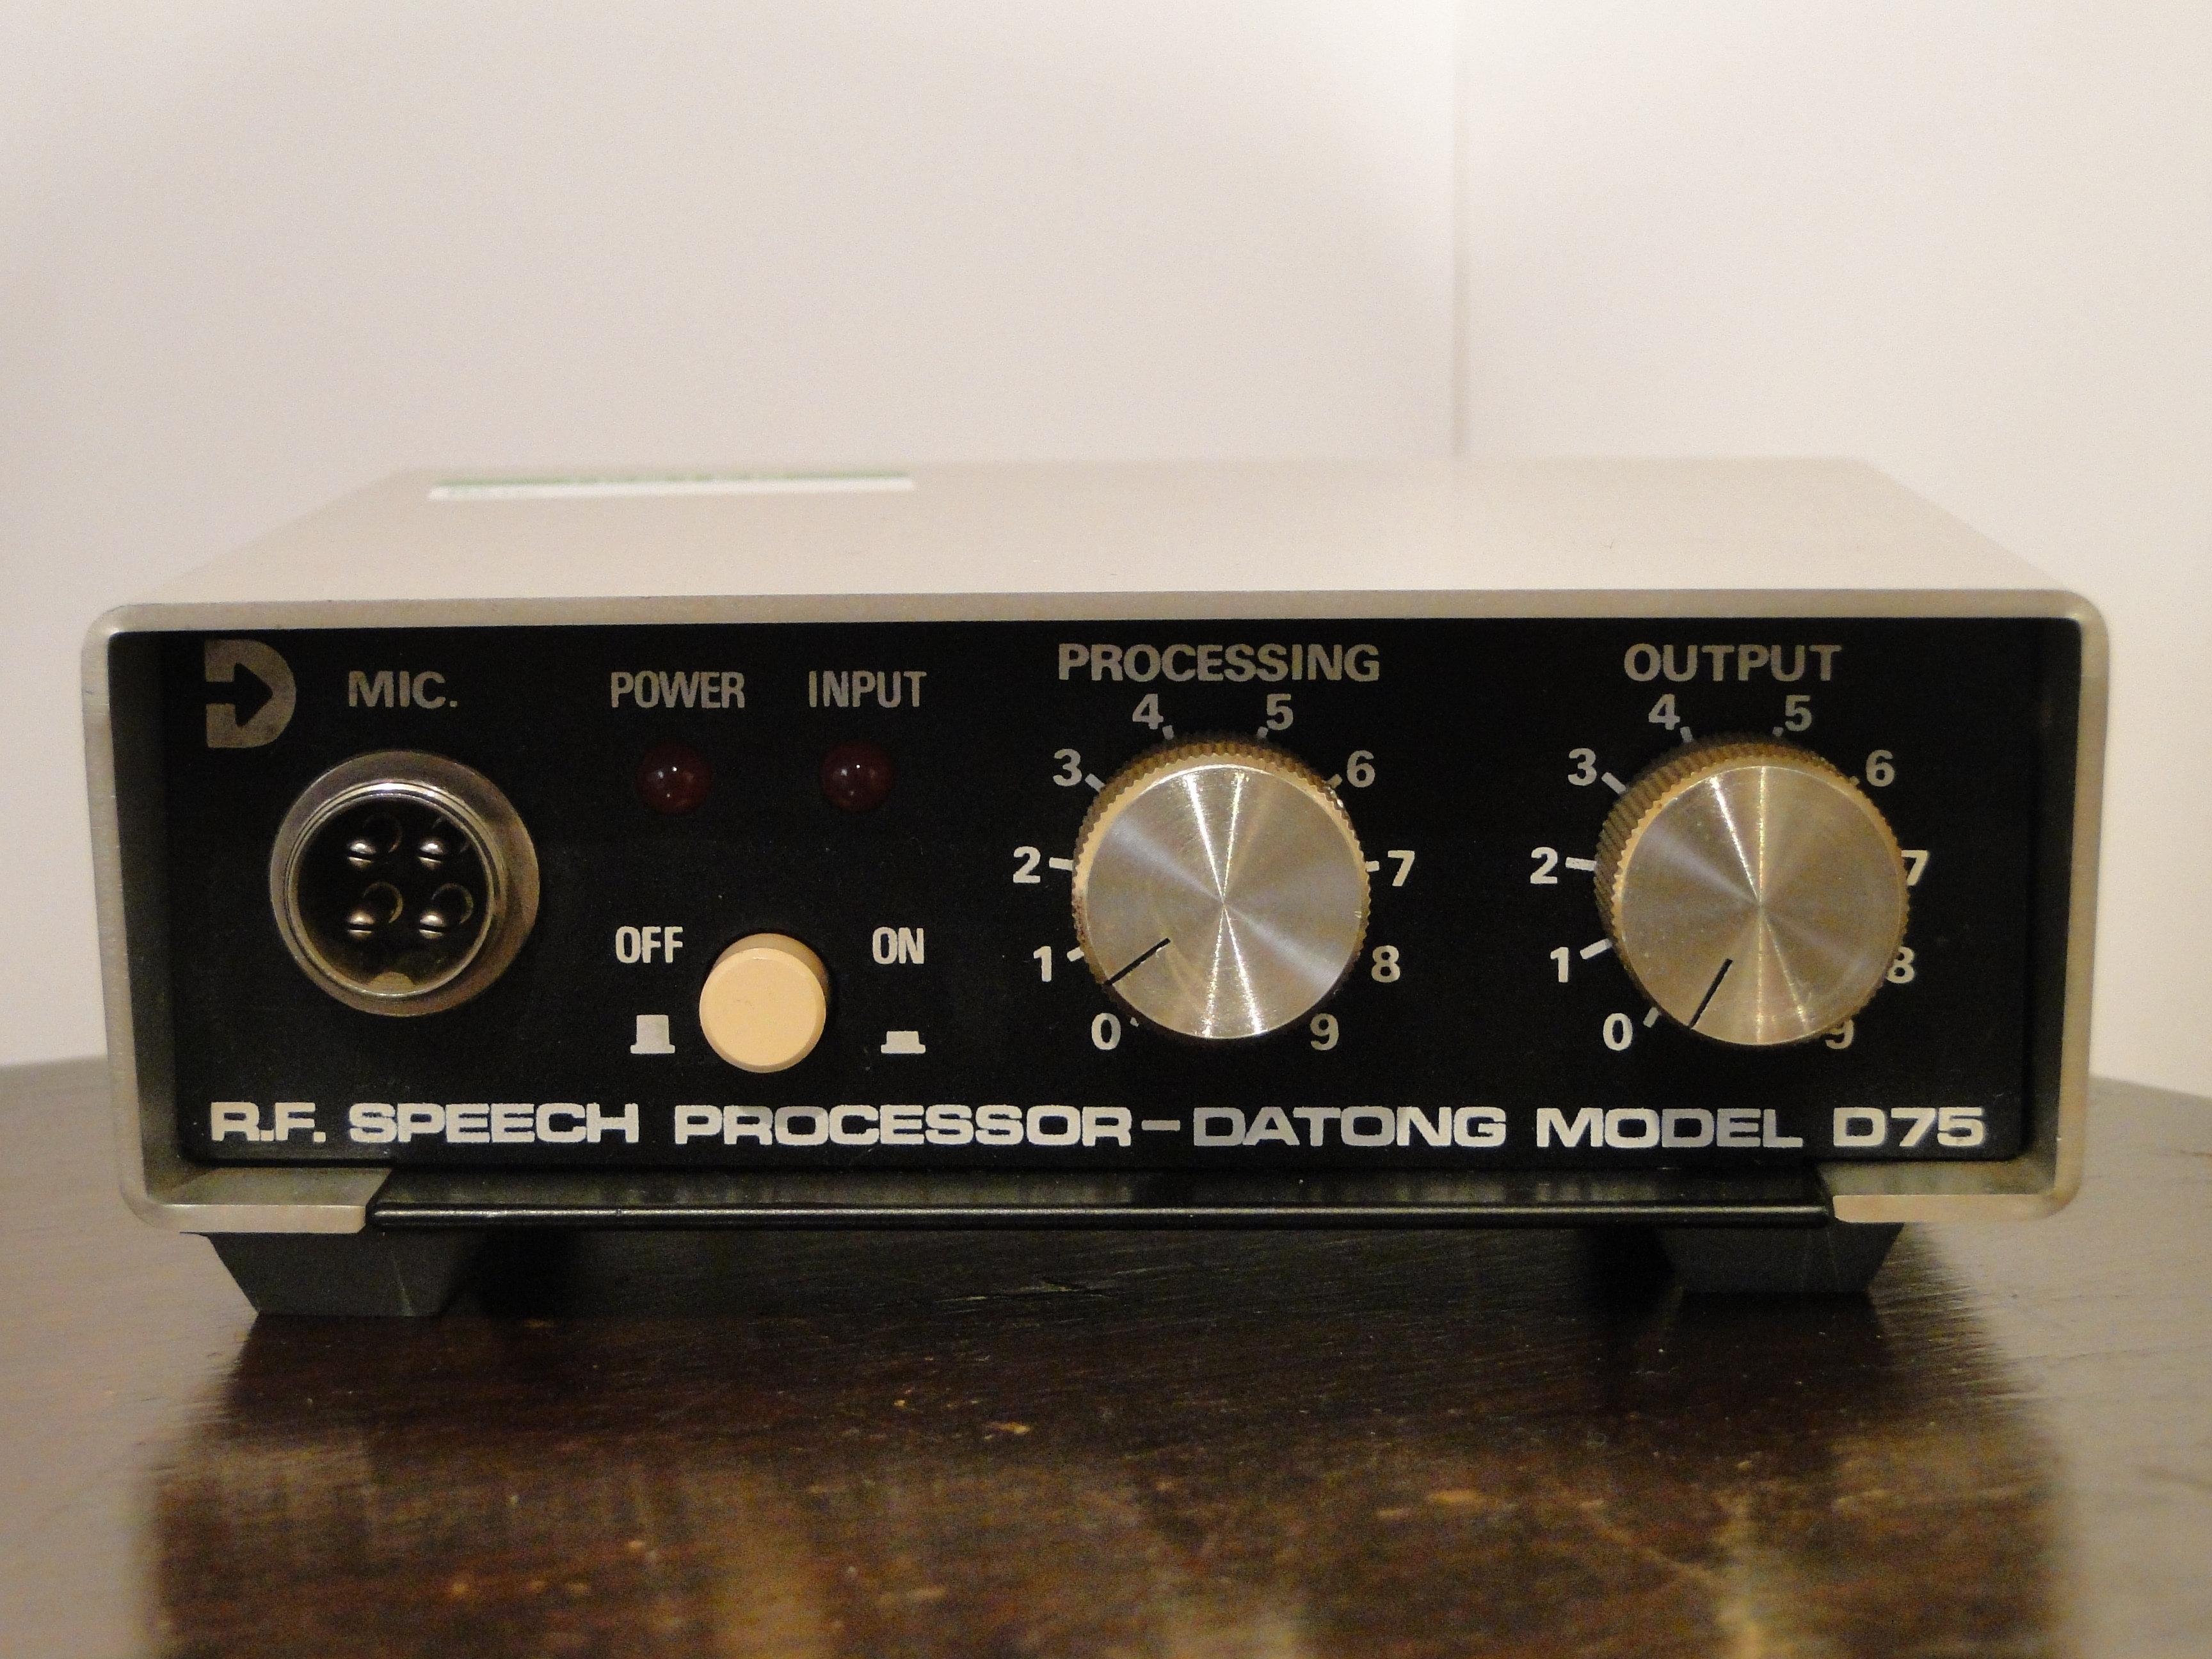 R F Datong electronics Limited model D75 (4-pin) speech processor